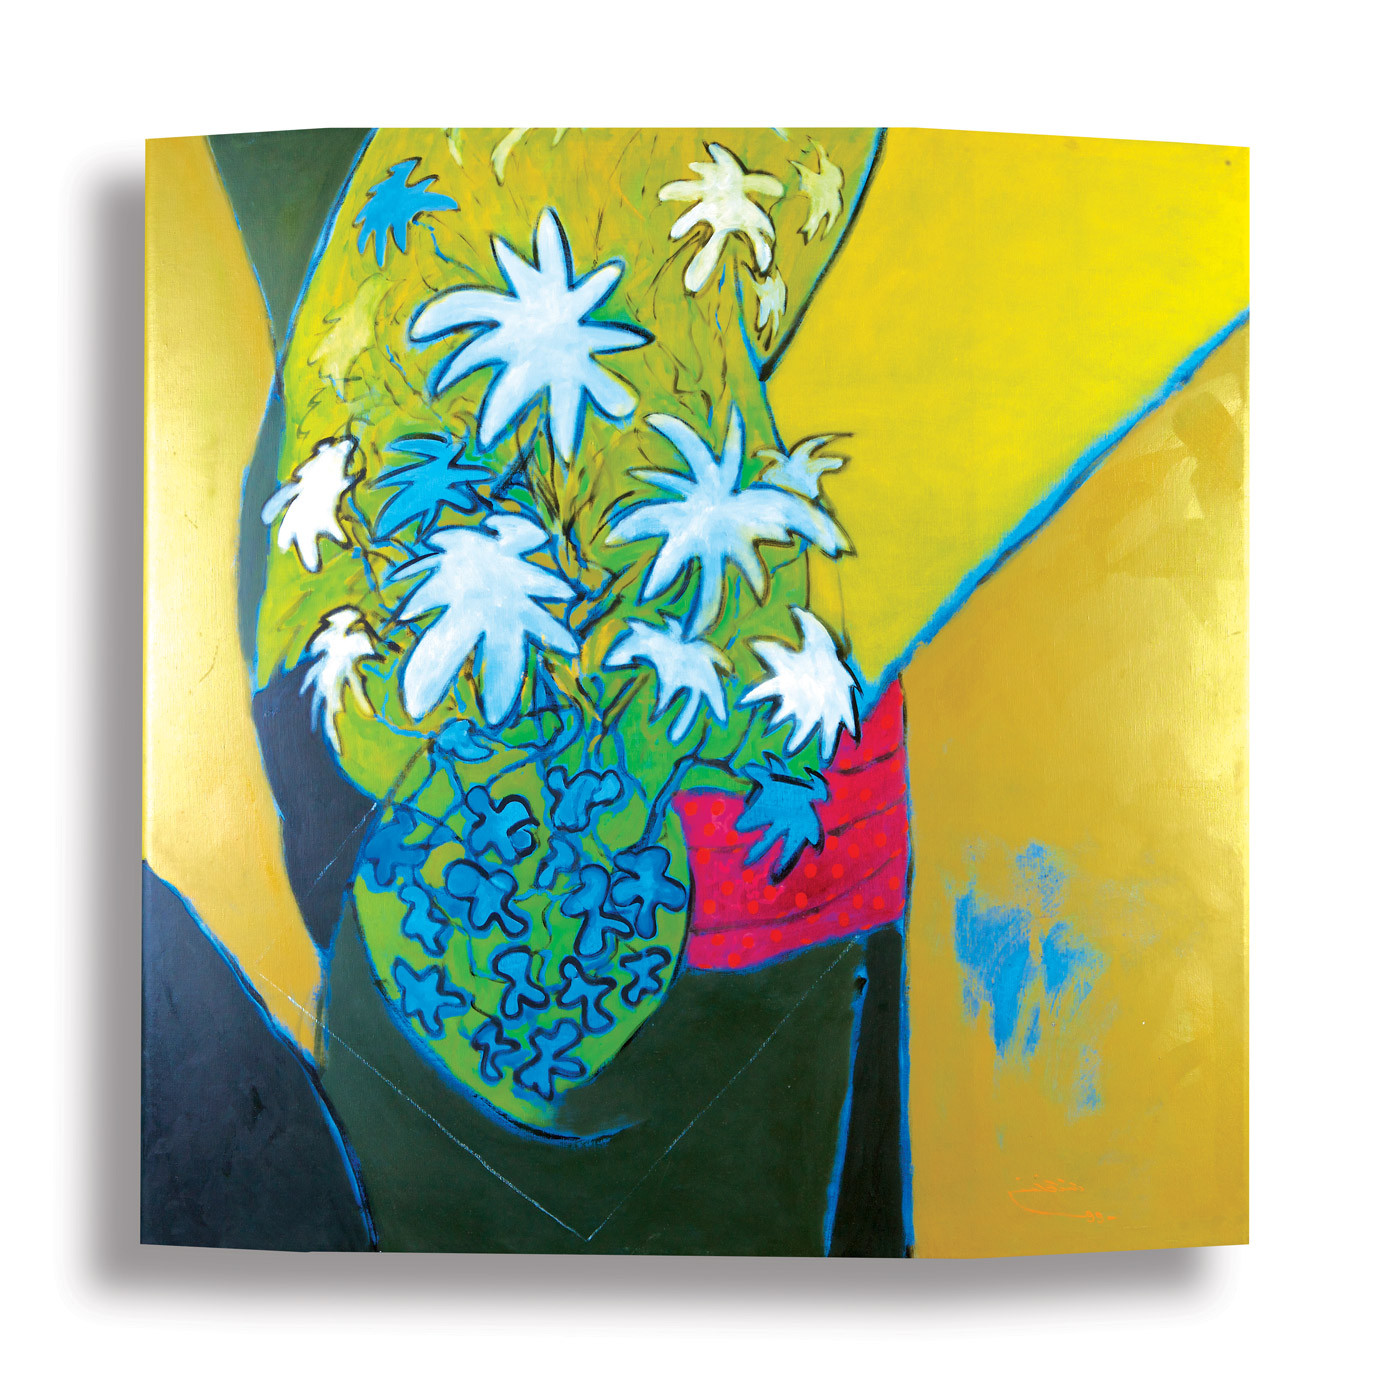 Fragmented-Abstraction-(3)_1999_Oil-on-canvas_200-x-129-cm rashid al khalifa